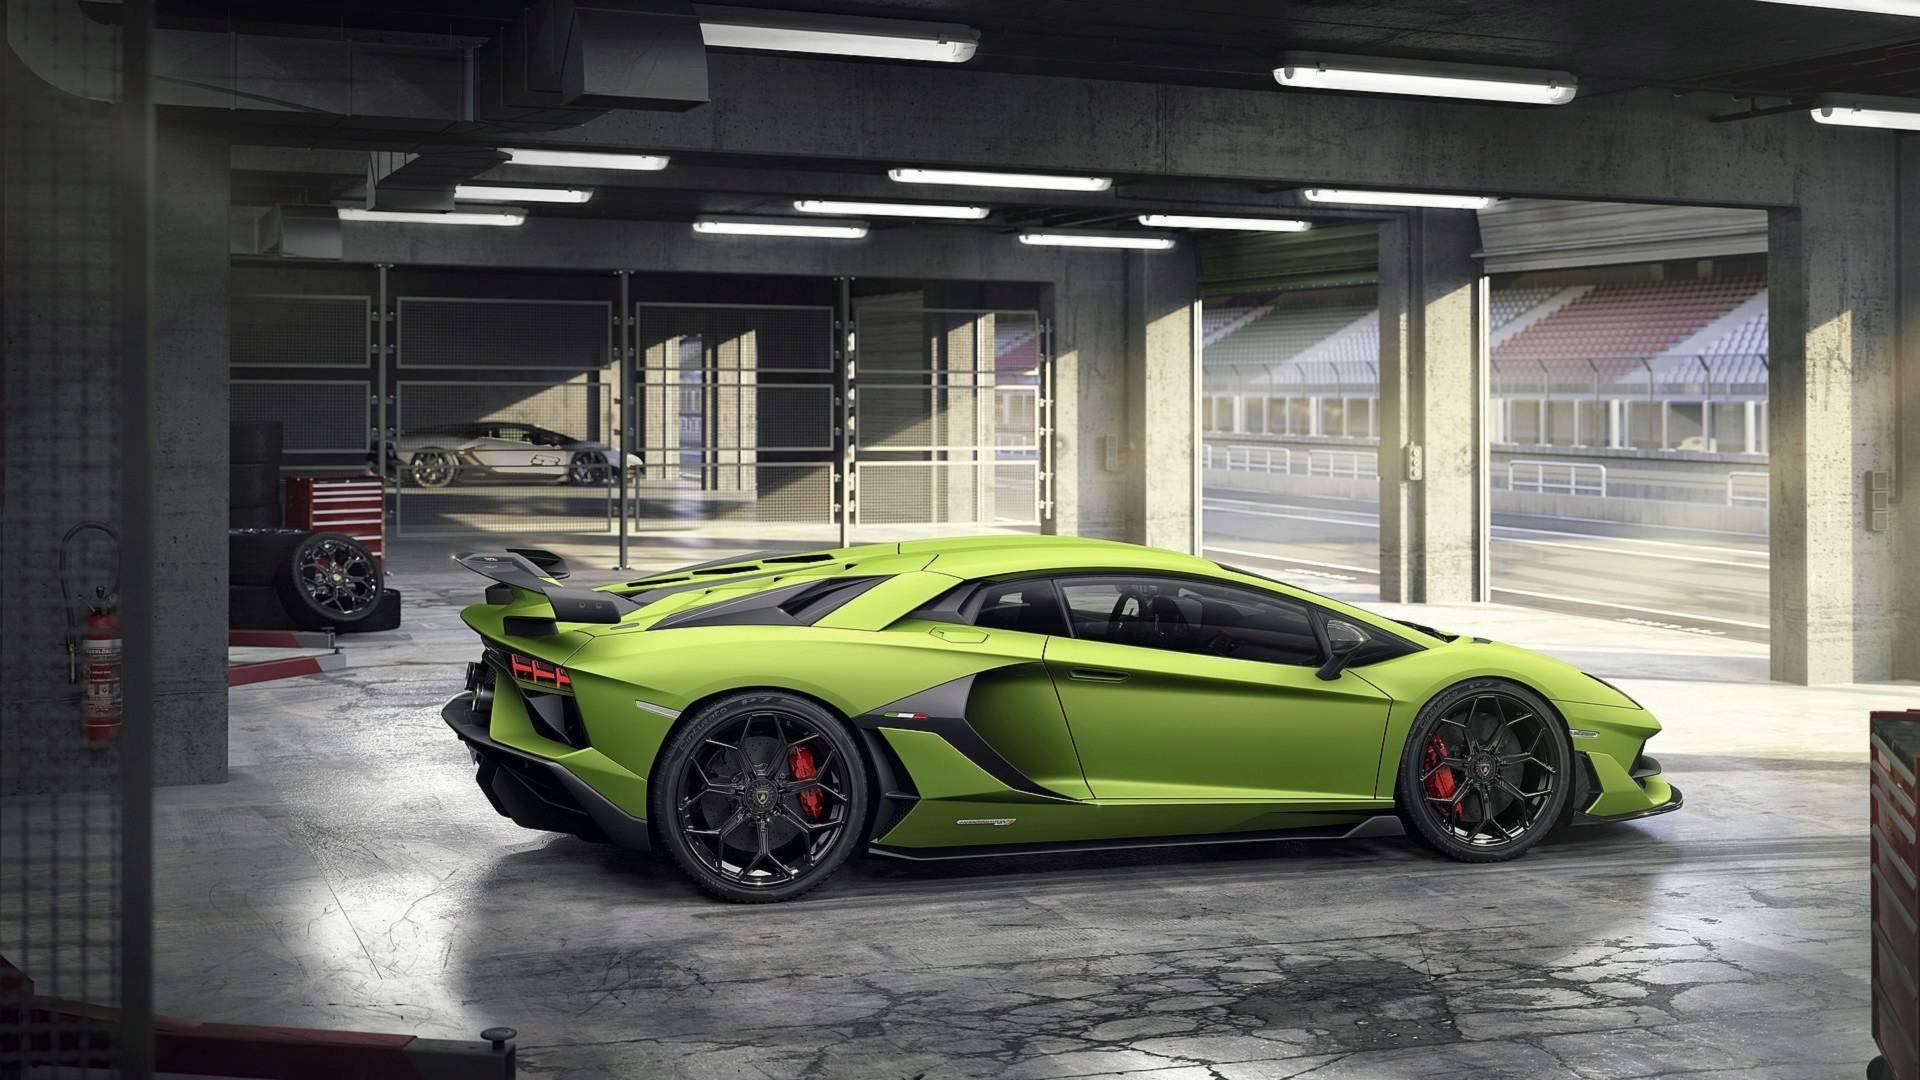 2019 Lamborghini Aventador Svj Revealed Priced At 517 700